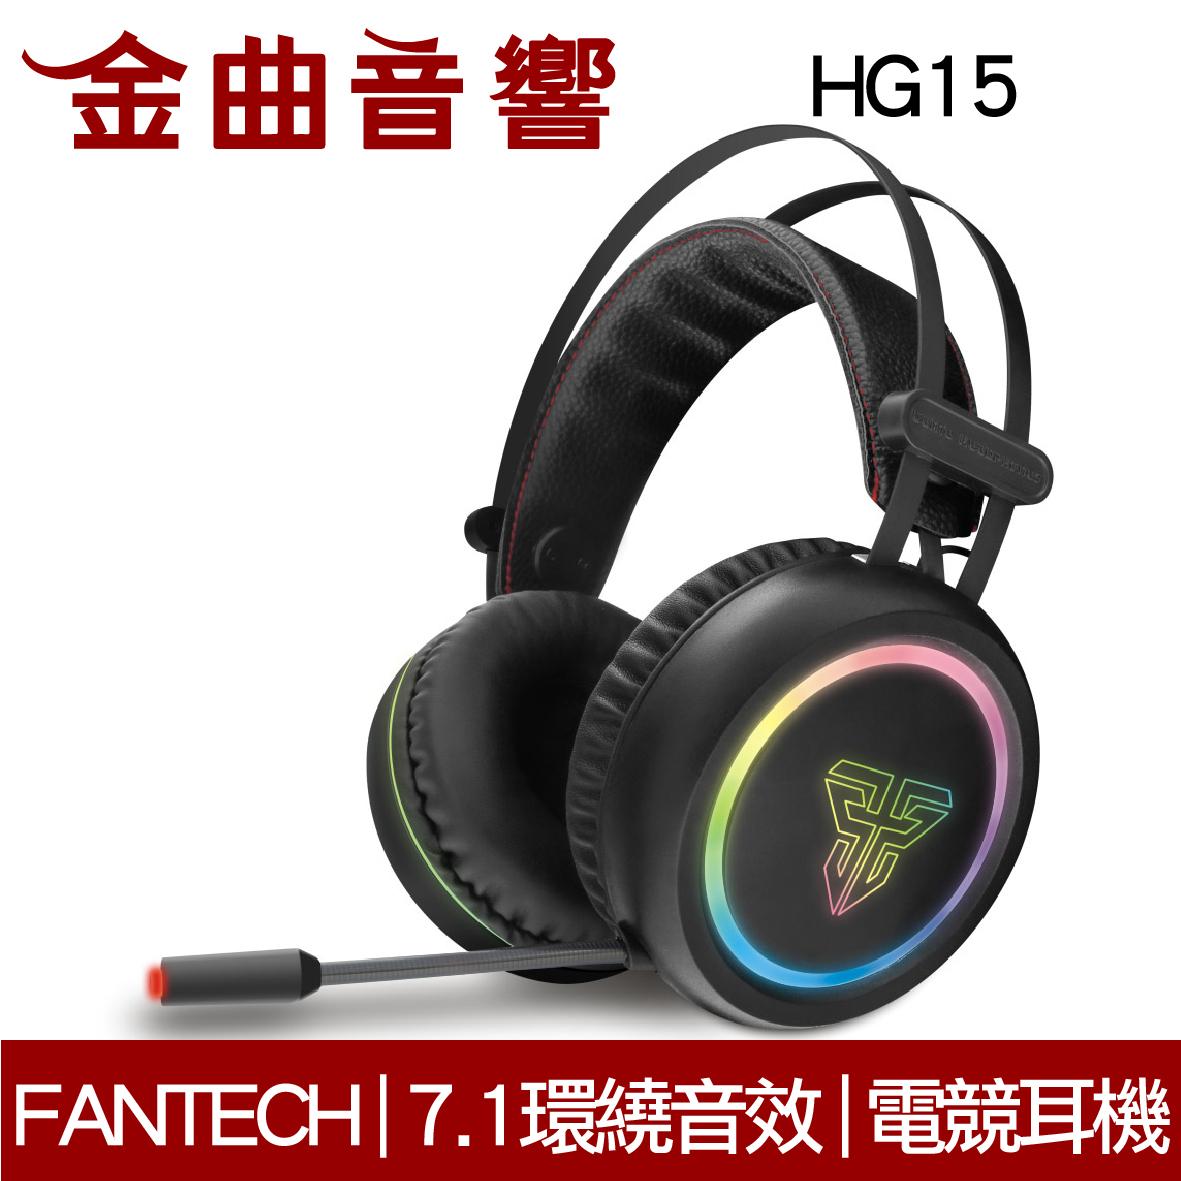 FANTECH HG15 7.1環繞音效 RGB光圈 耳罩式電競耳機 | 金曲音響。人氣店家金曲音響的【耳機類別】、所有耳機有最棒的商品。快到日本NO.1的Rakuten樂天市場的安全環境中盡情網路購